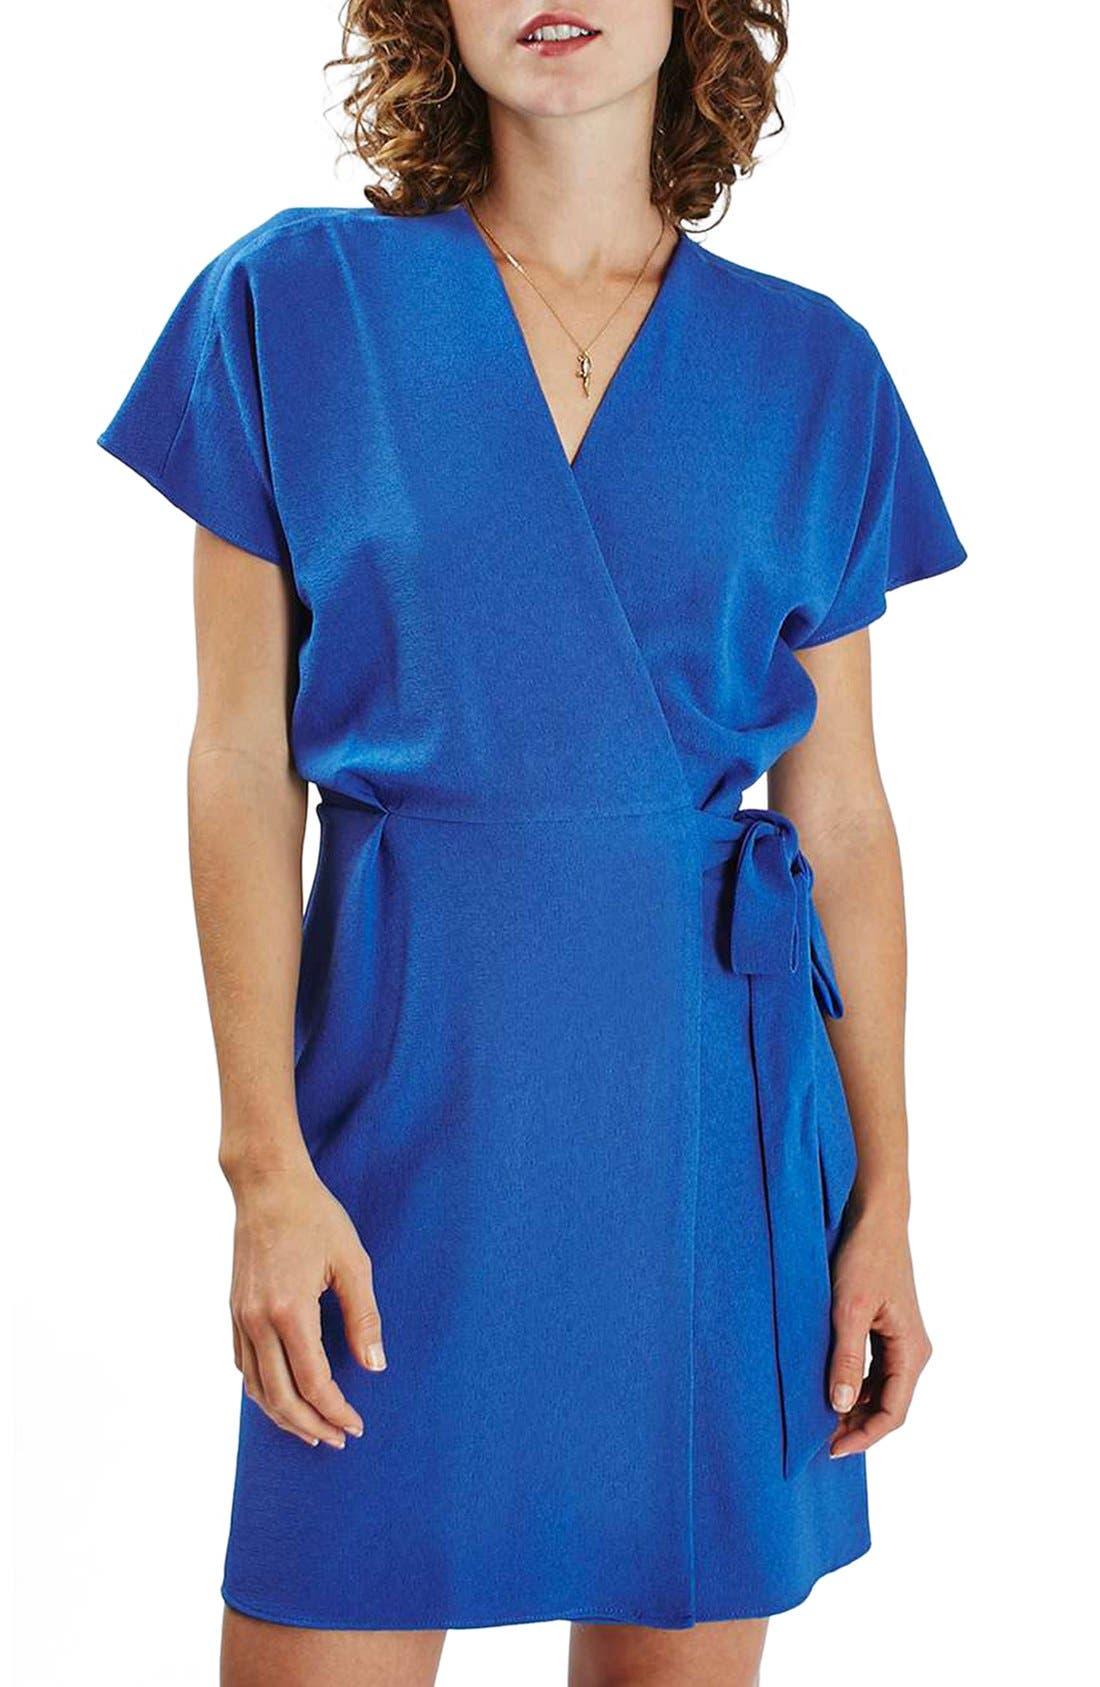 Alternate Image 1 Selected - Topshop Tie Wrap Minidress